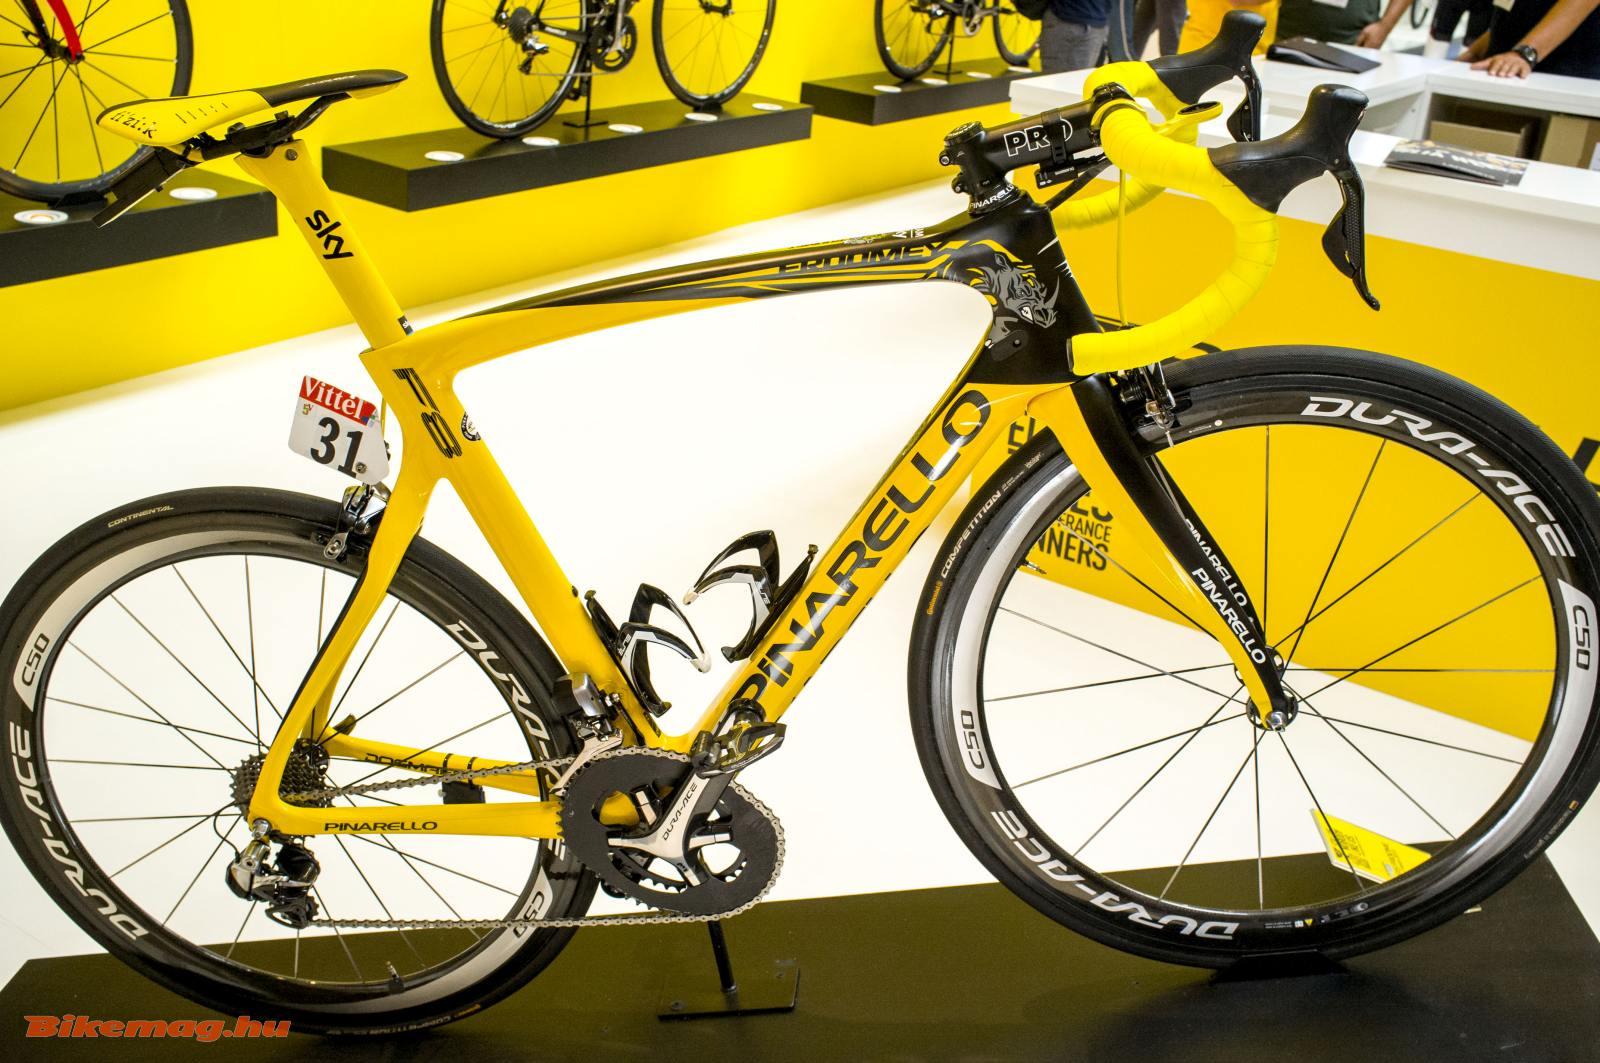 Chris Froome Tour de France-győztes Pinarello Dogma F8 kerékpárja